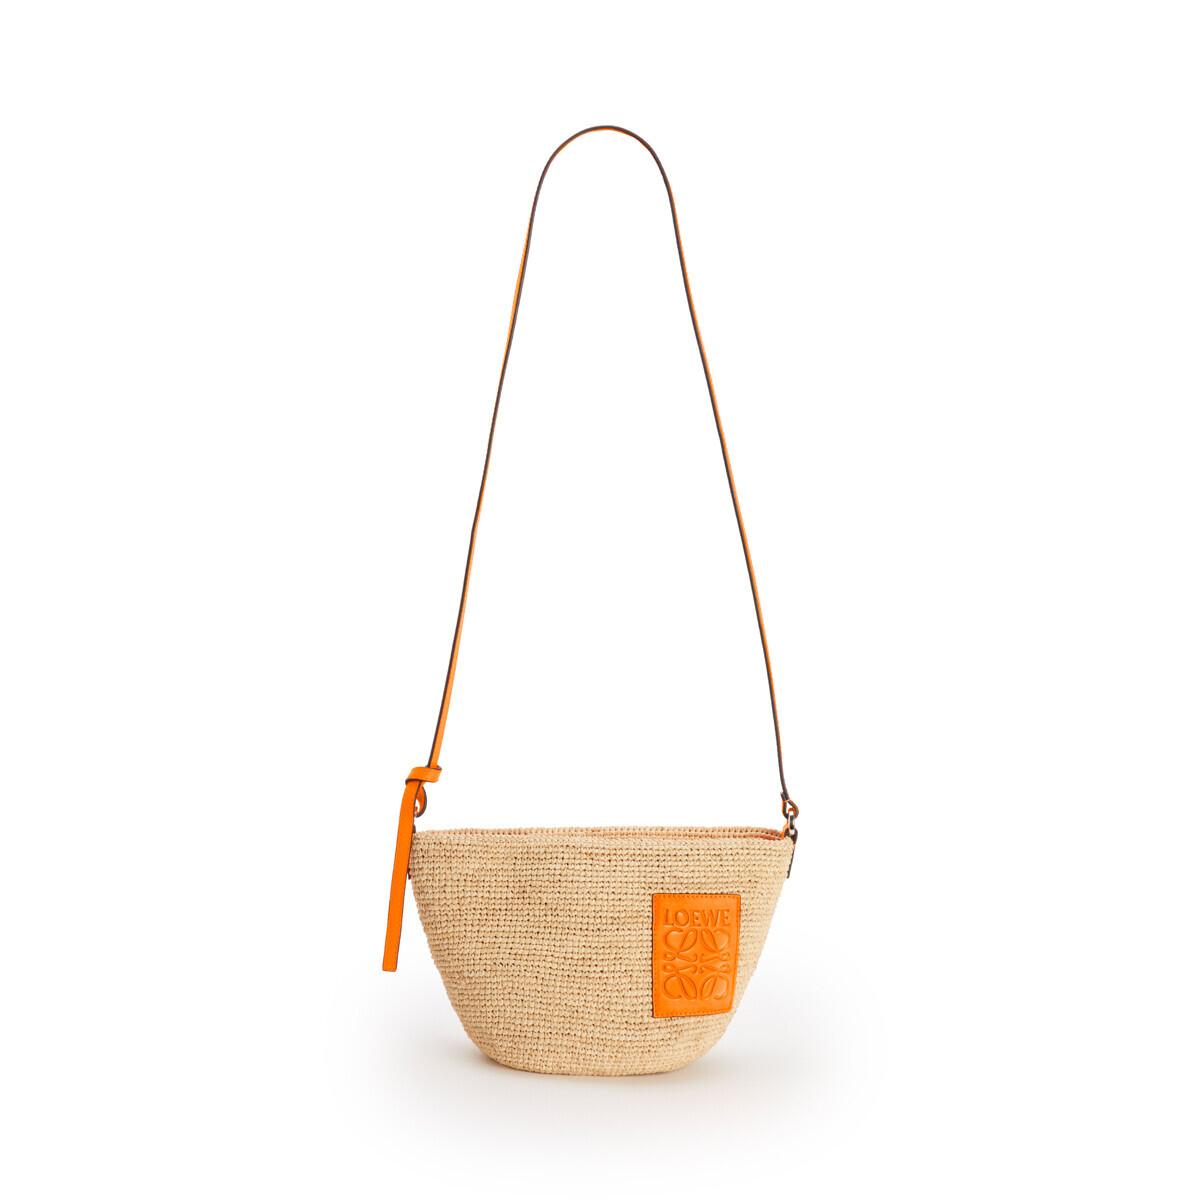 LOEWE 酒椰纤维和小牛皮 Pochette 手袋 Natural/Neon Orange front